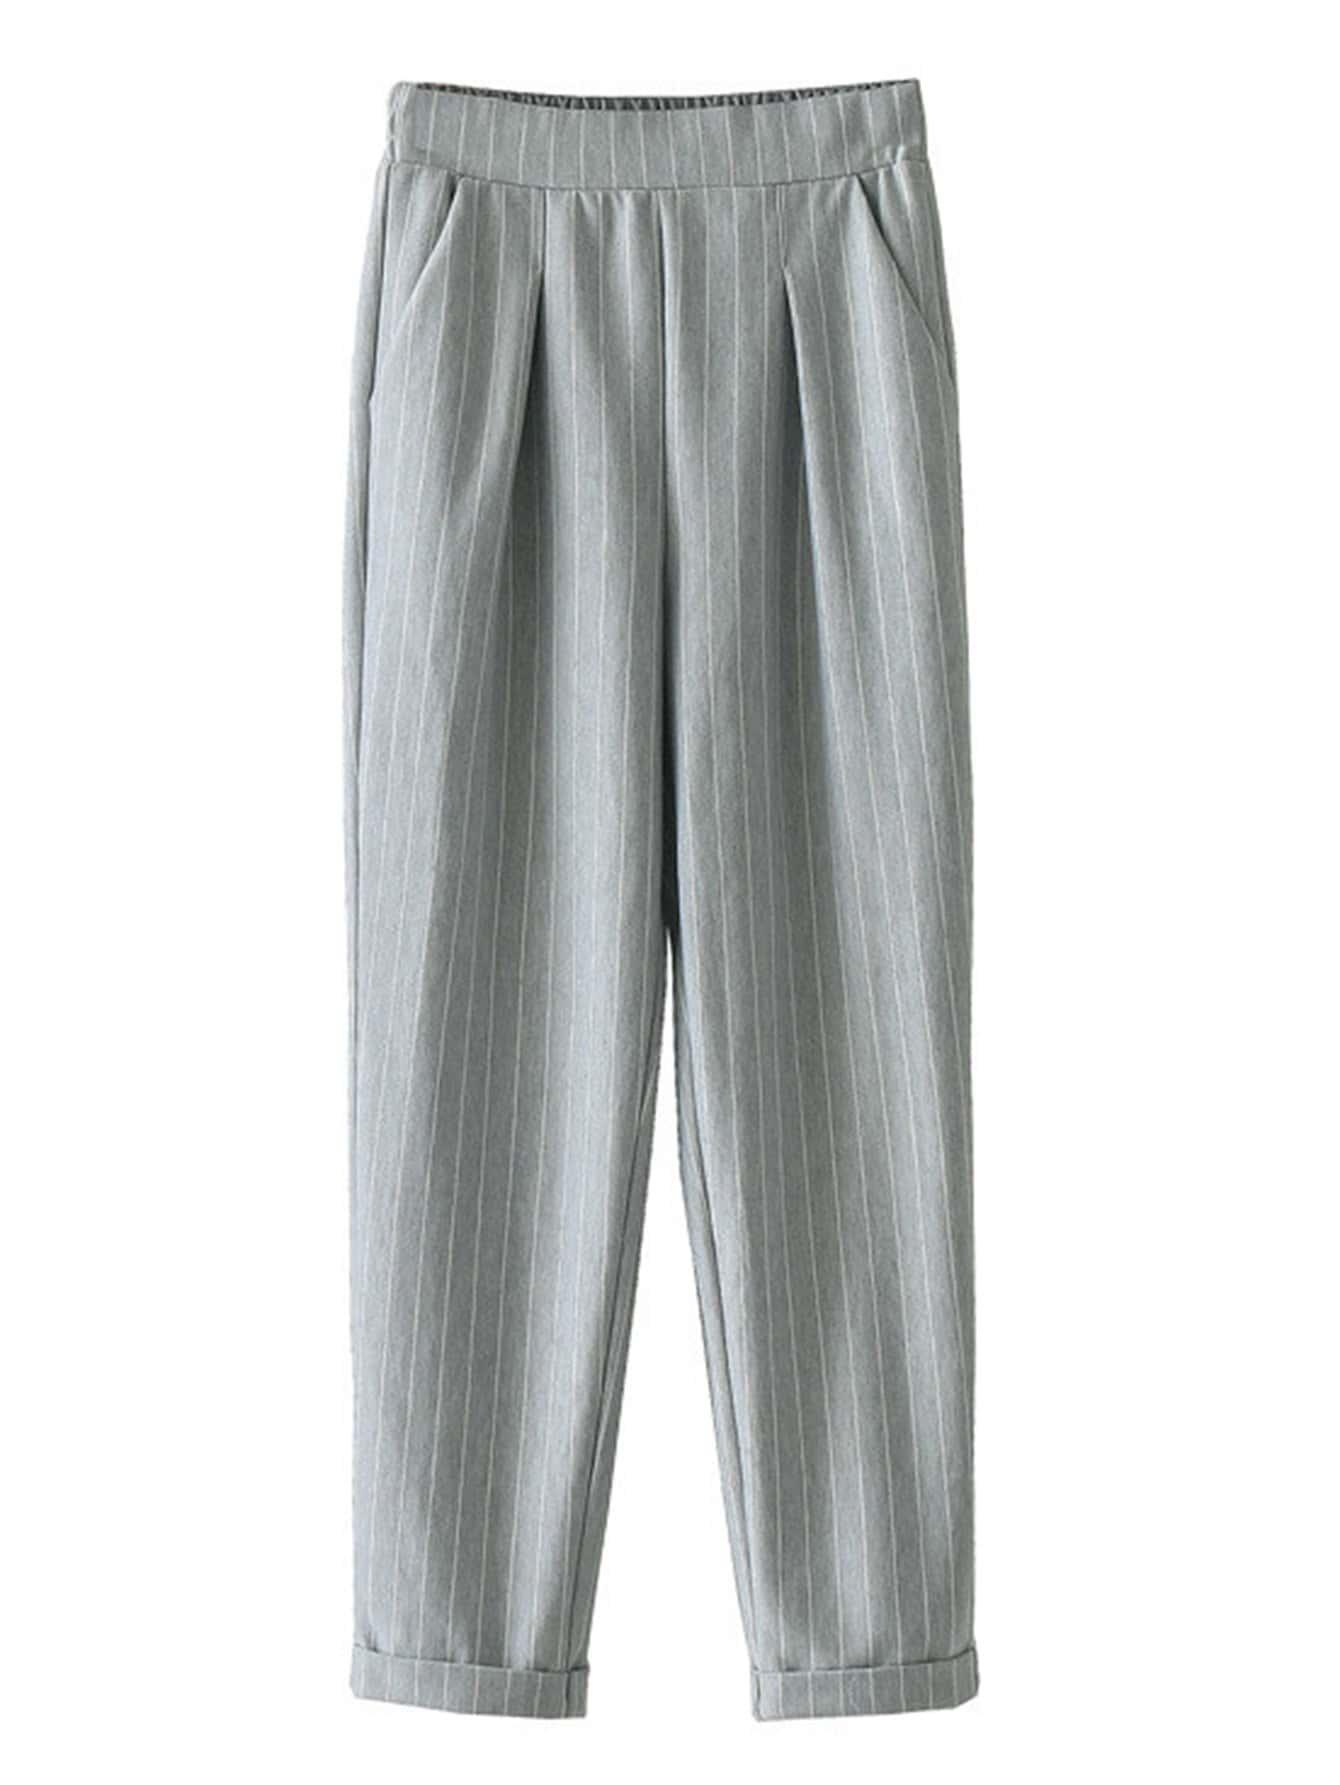 Pantalones de rayas verticales spanish romwe - Paredes a rayas verticales ...